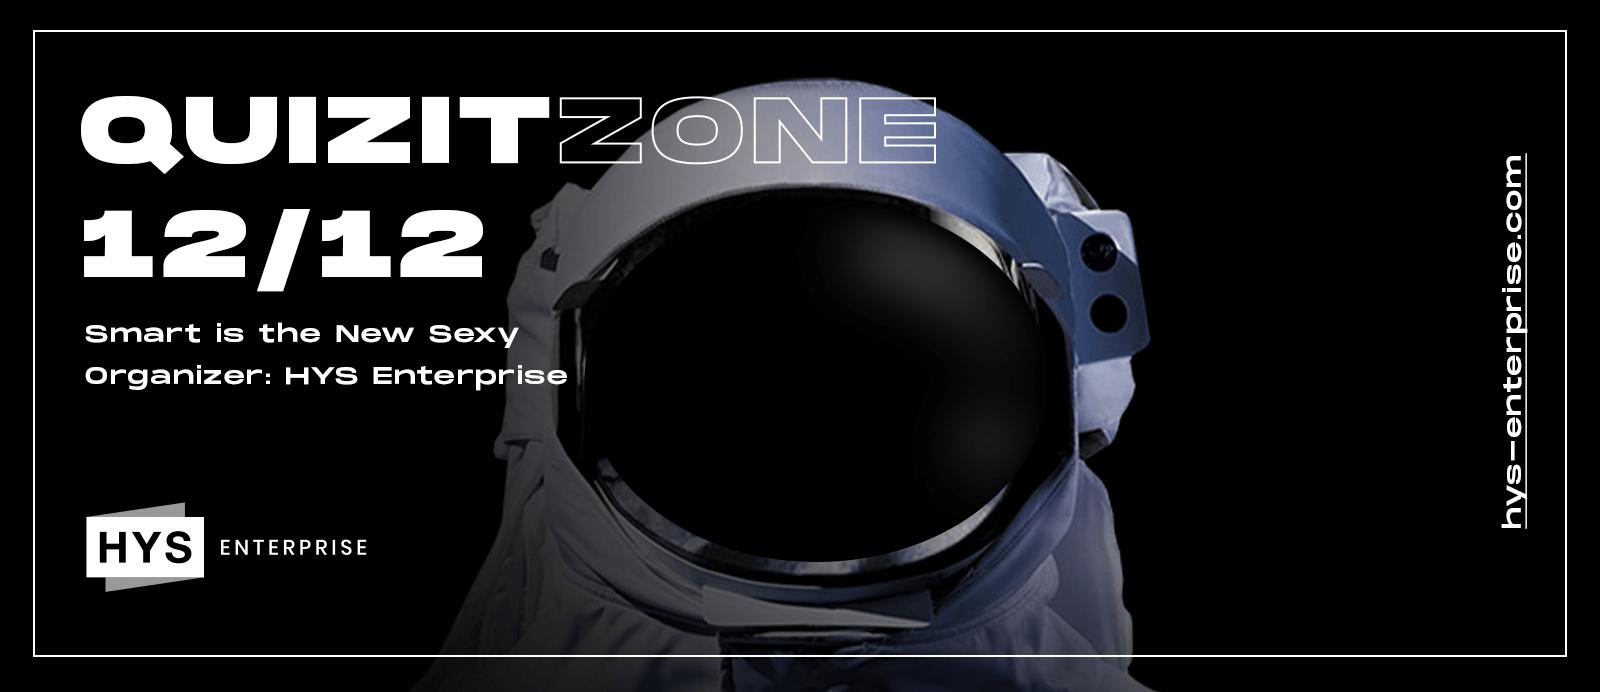 Quiz IT Zone. Online format